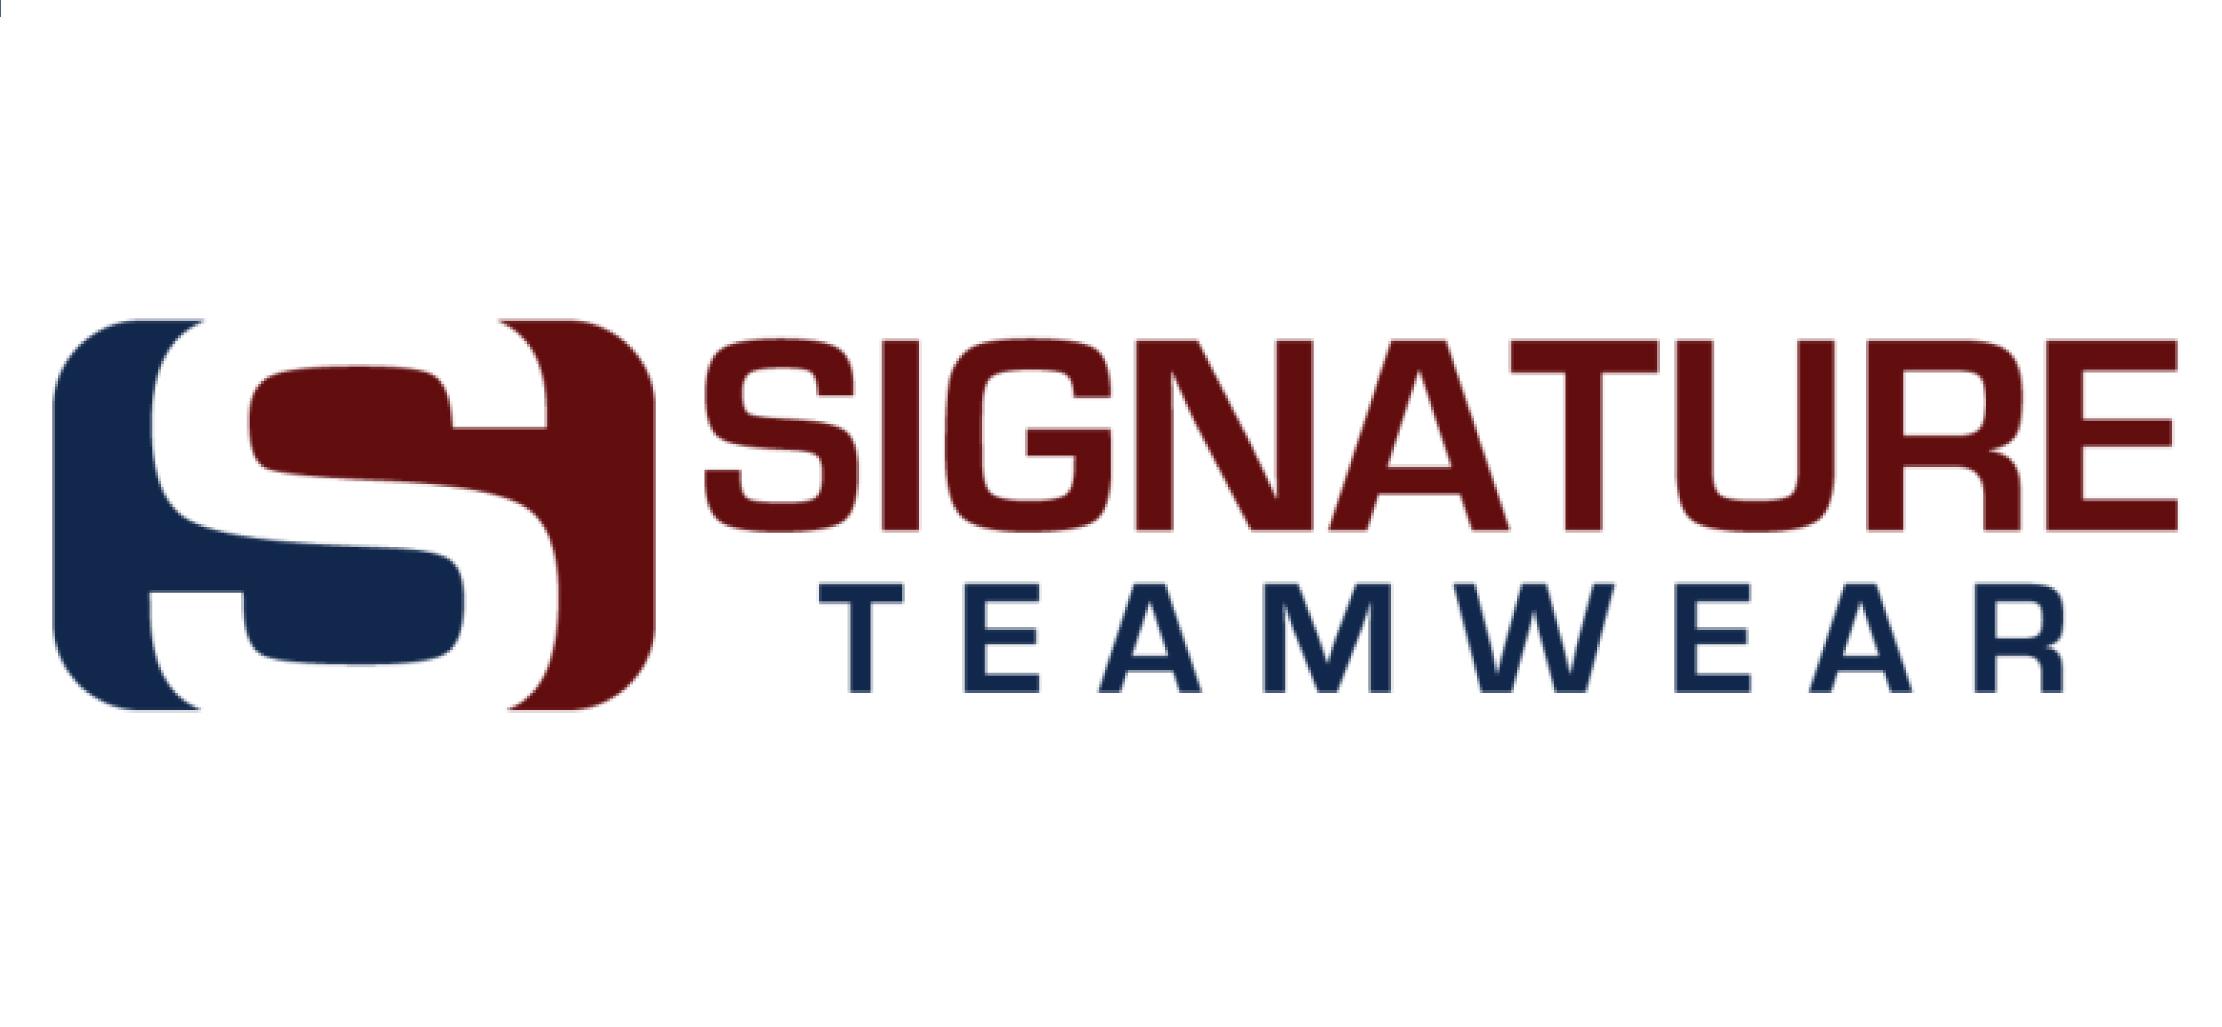 Signature Teamwear